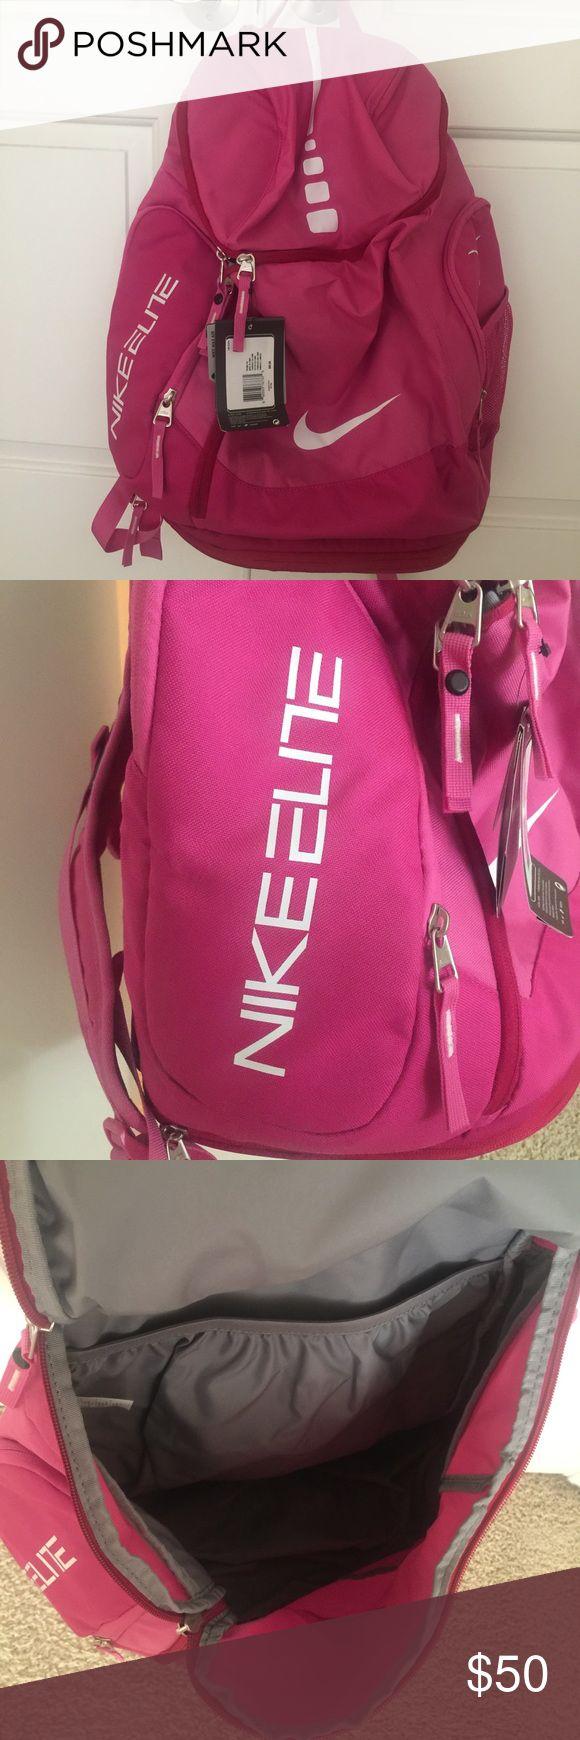 Nike Elite Basketball Bag/backpack Brand new with tags Nike Elite Basketball bag.  In perfect condition - great pink color Nike Bags Backpacks